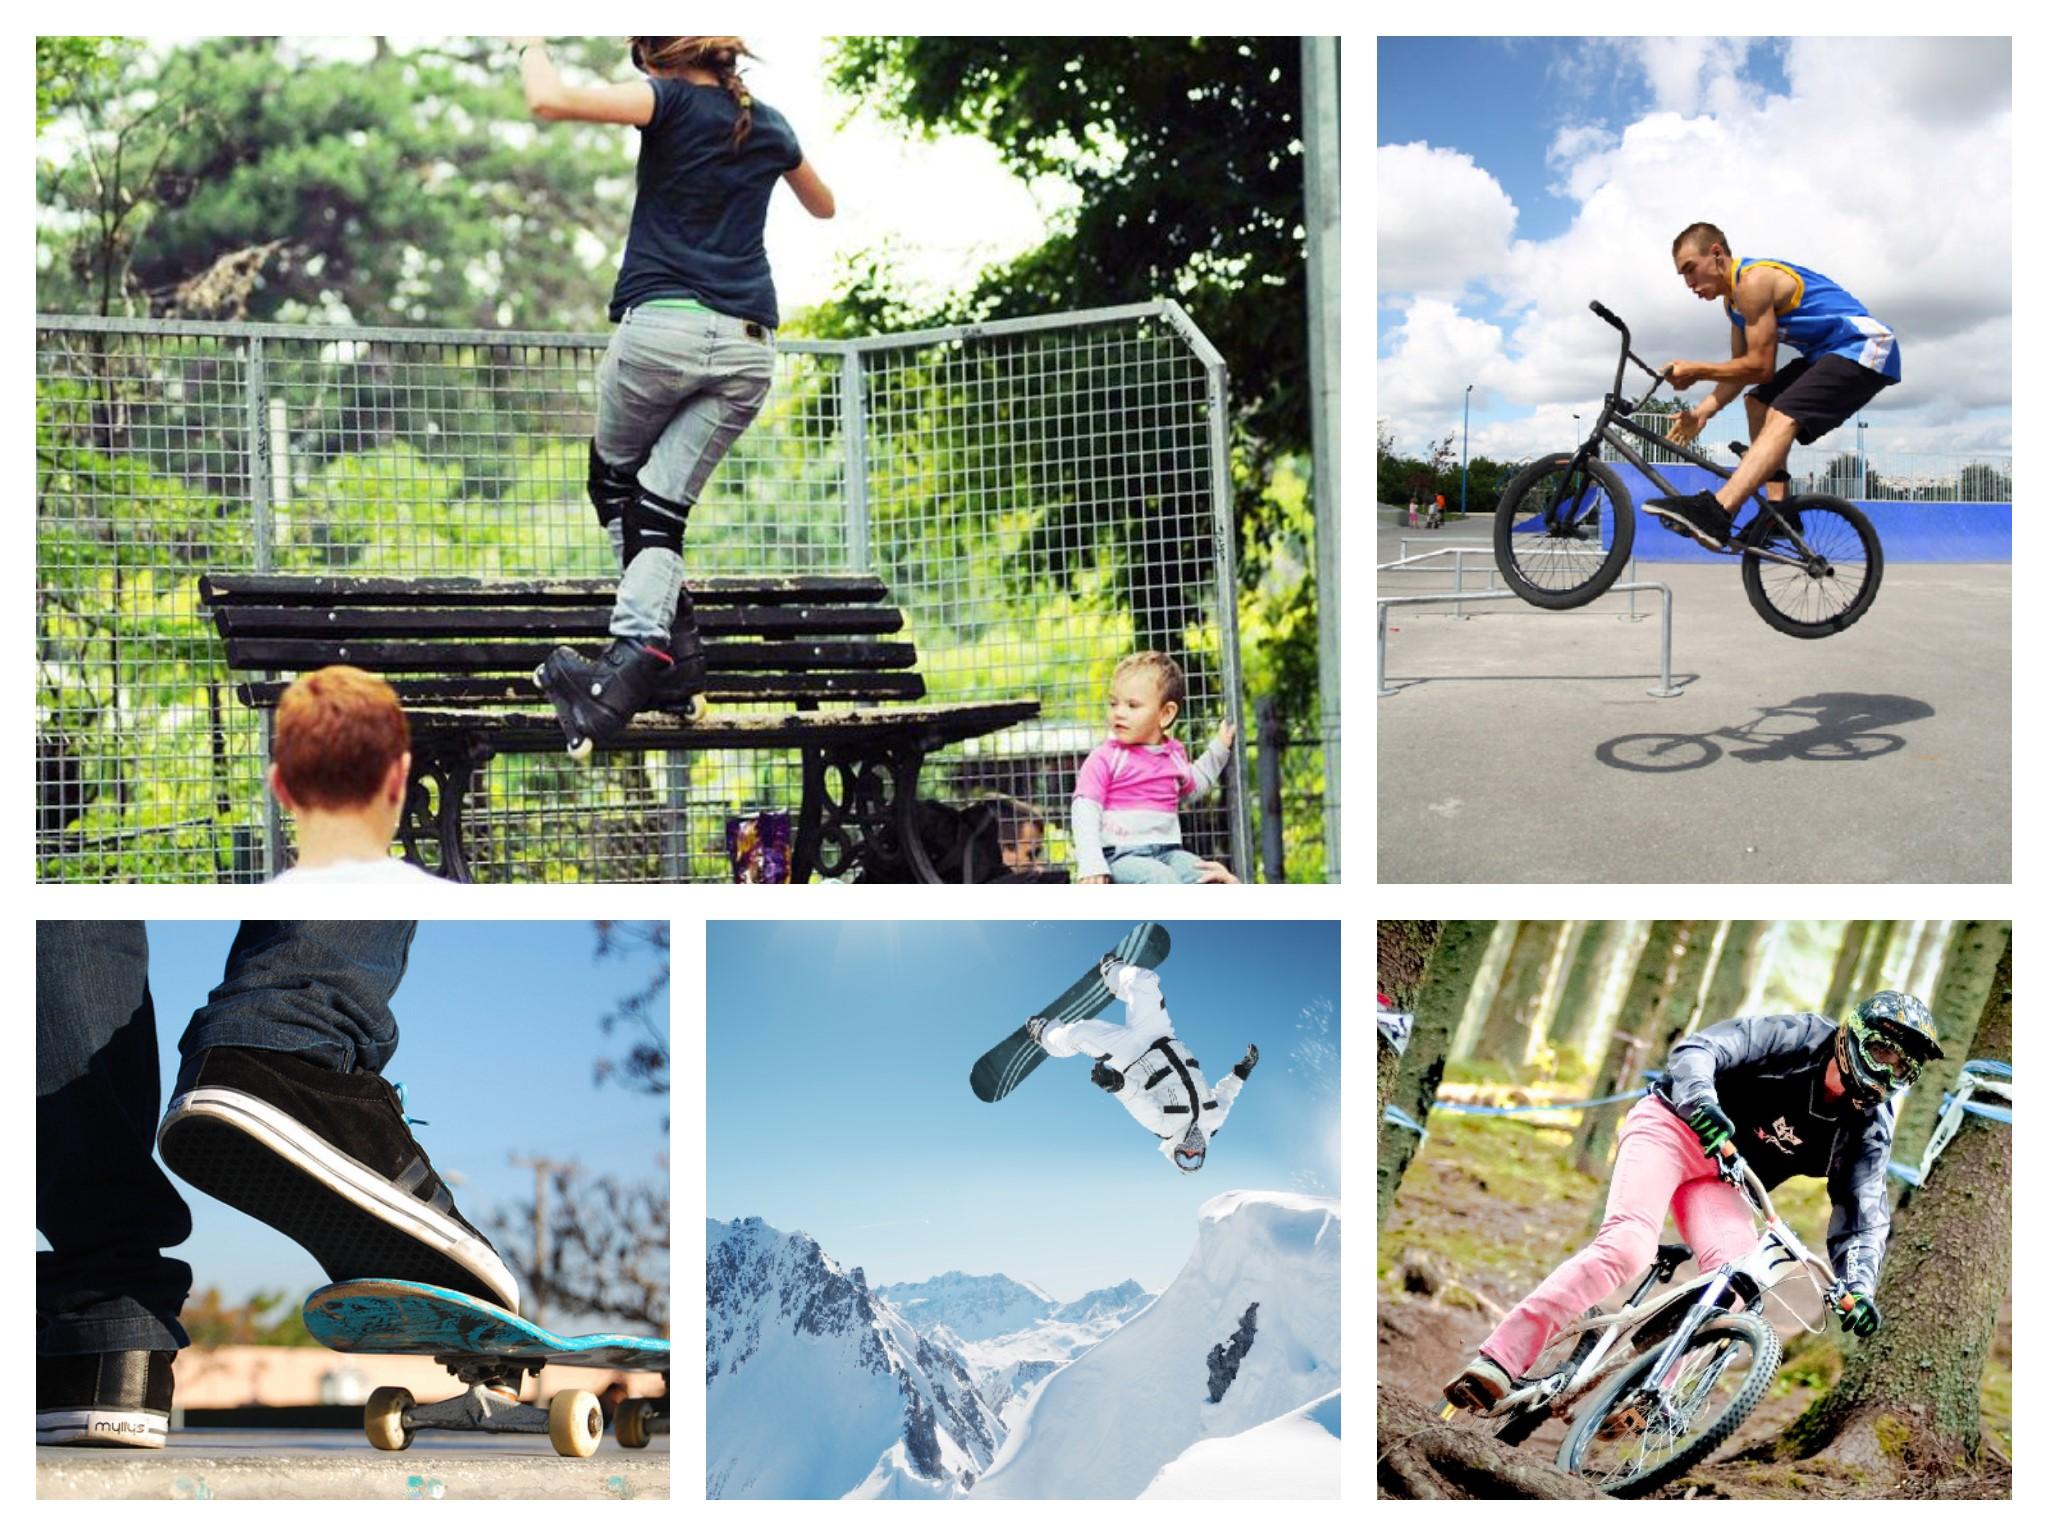 Sporturi extreme dincolo de fizic